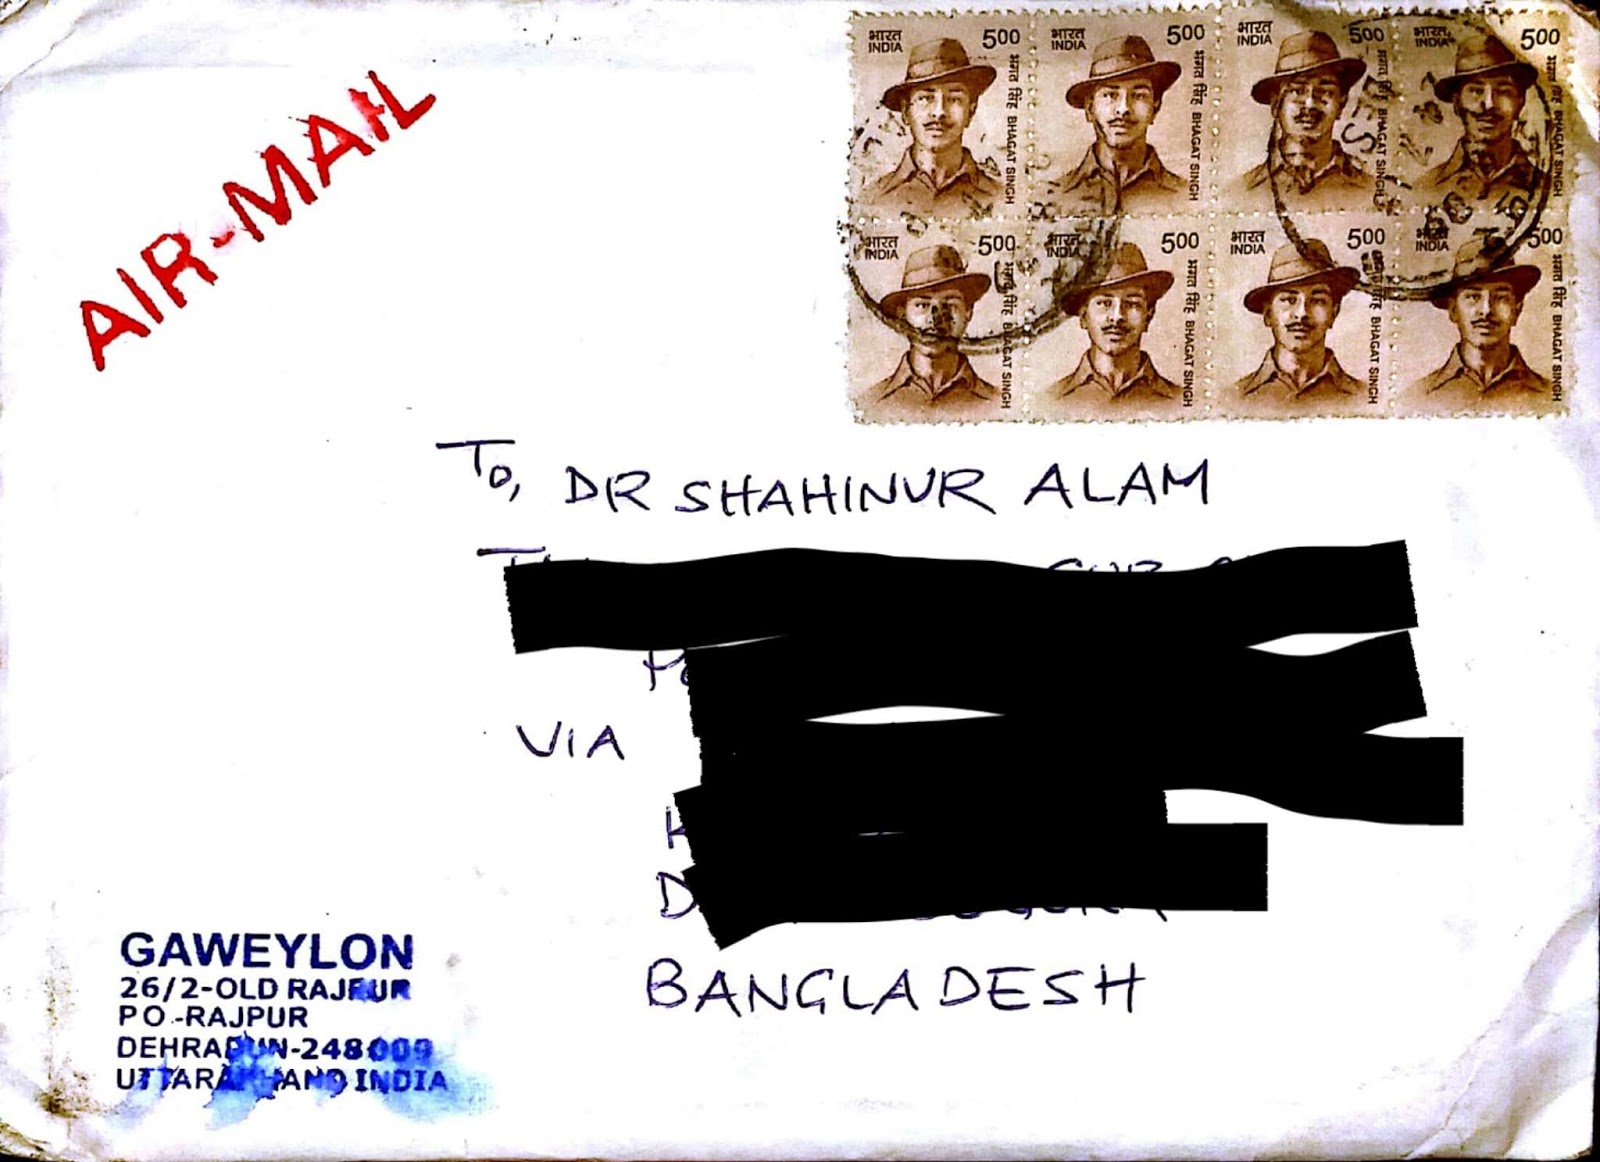 Gaweylon envelope